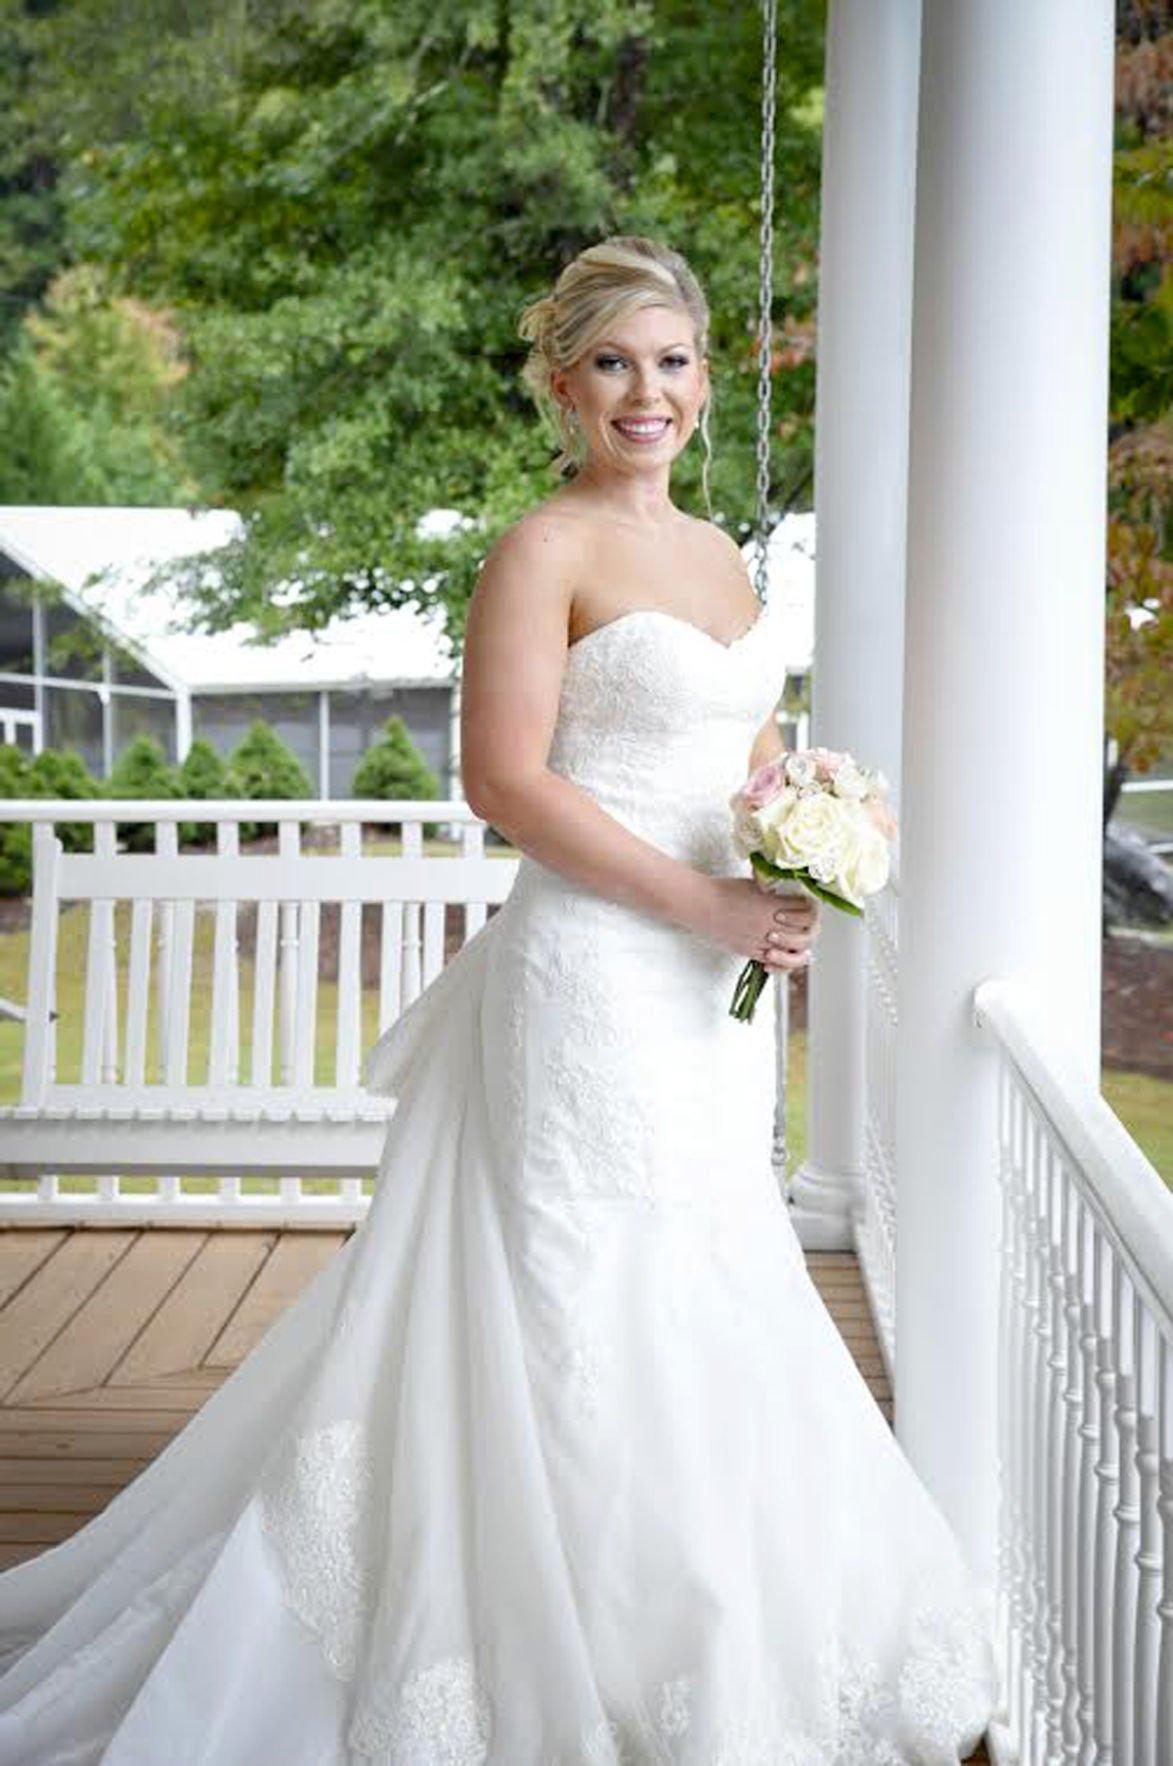 Mrs. Alex Tortoso